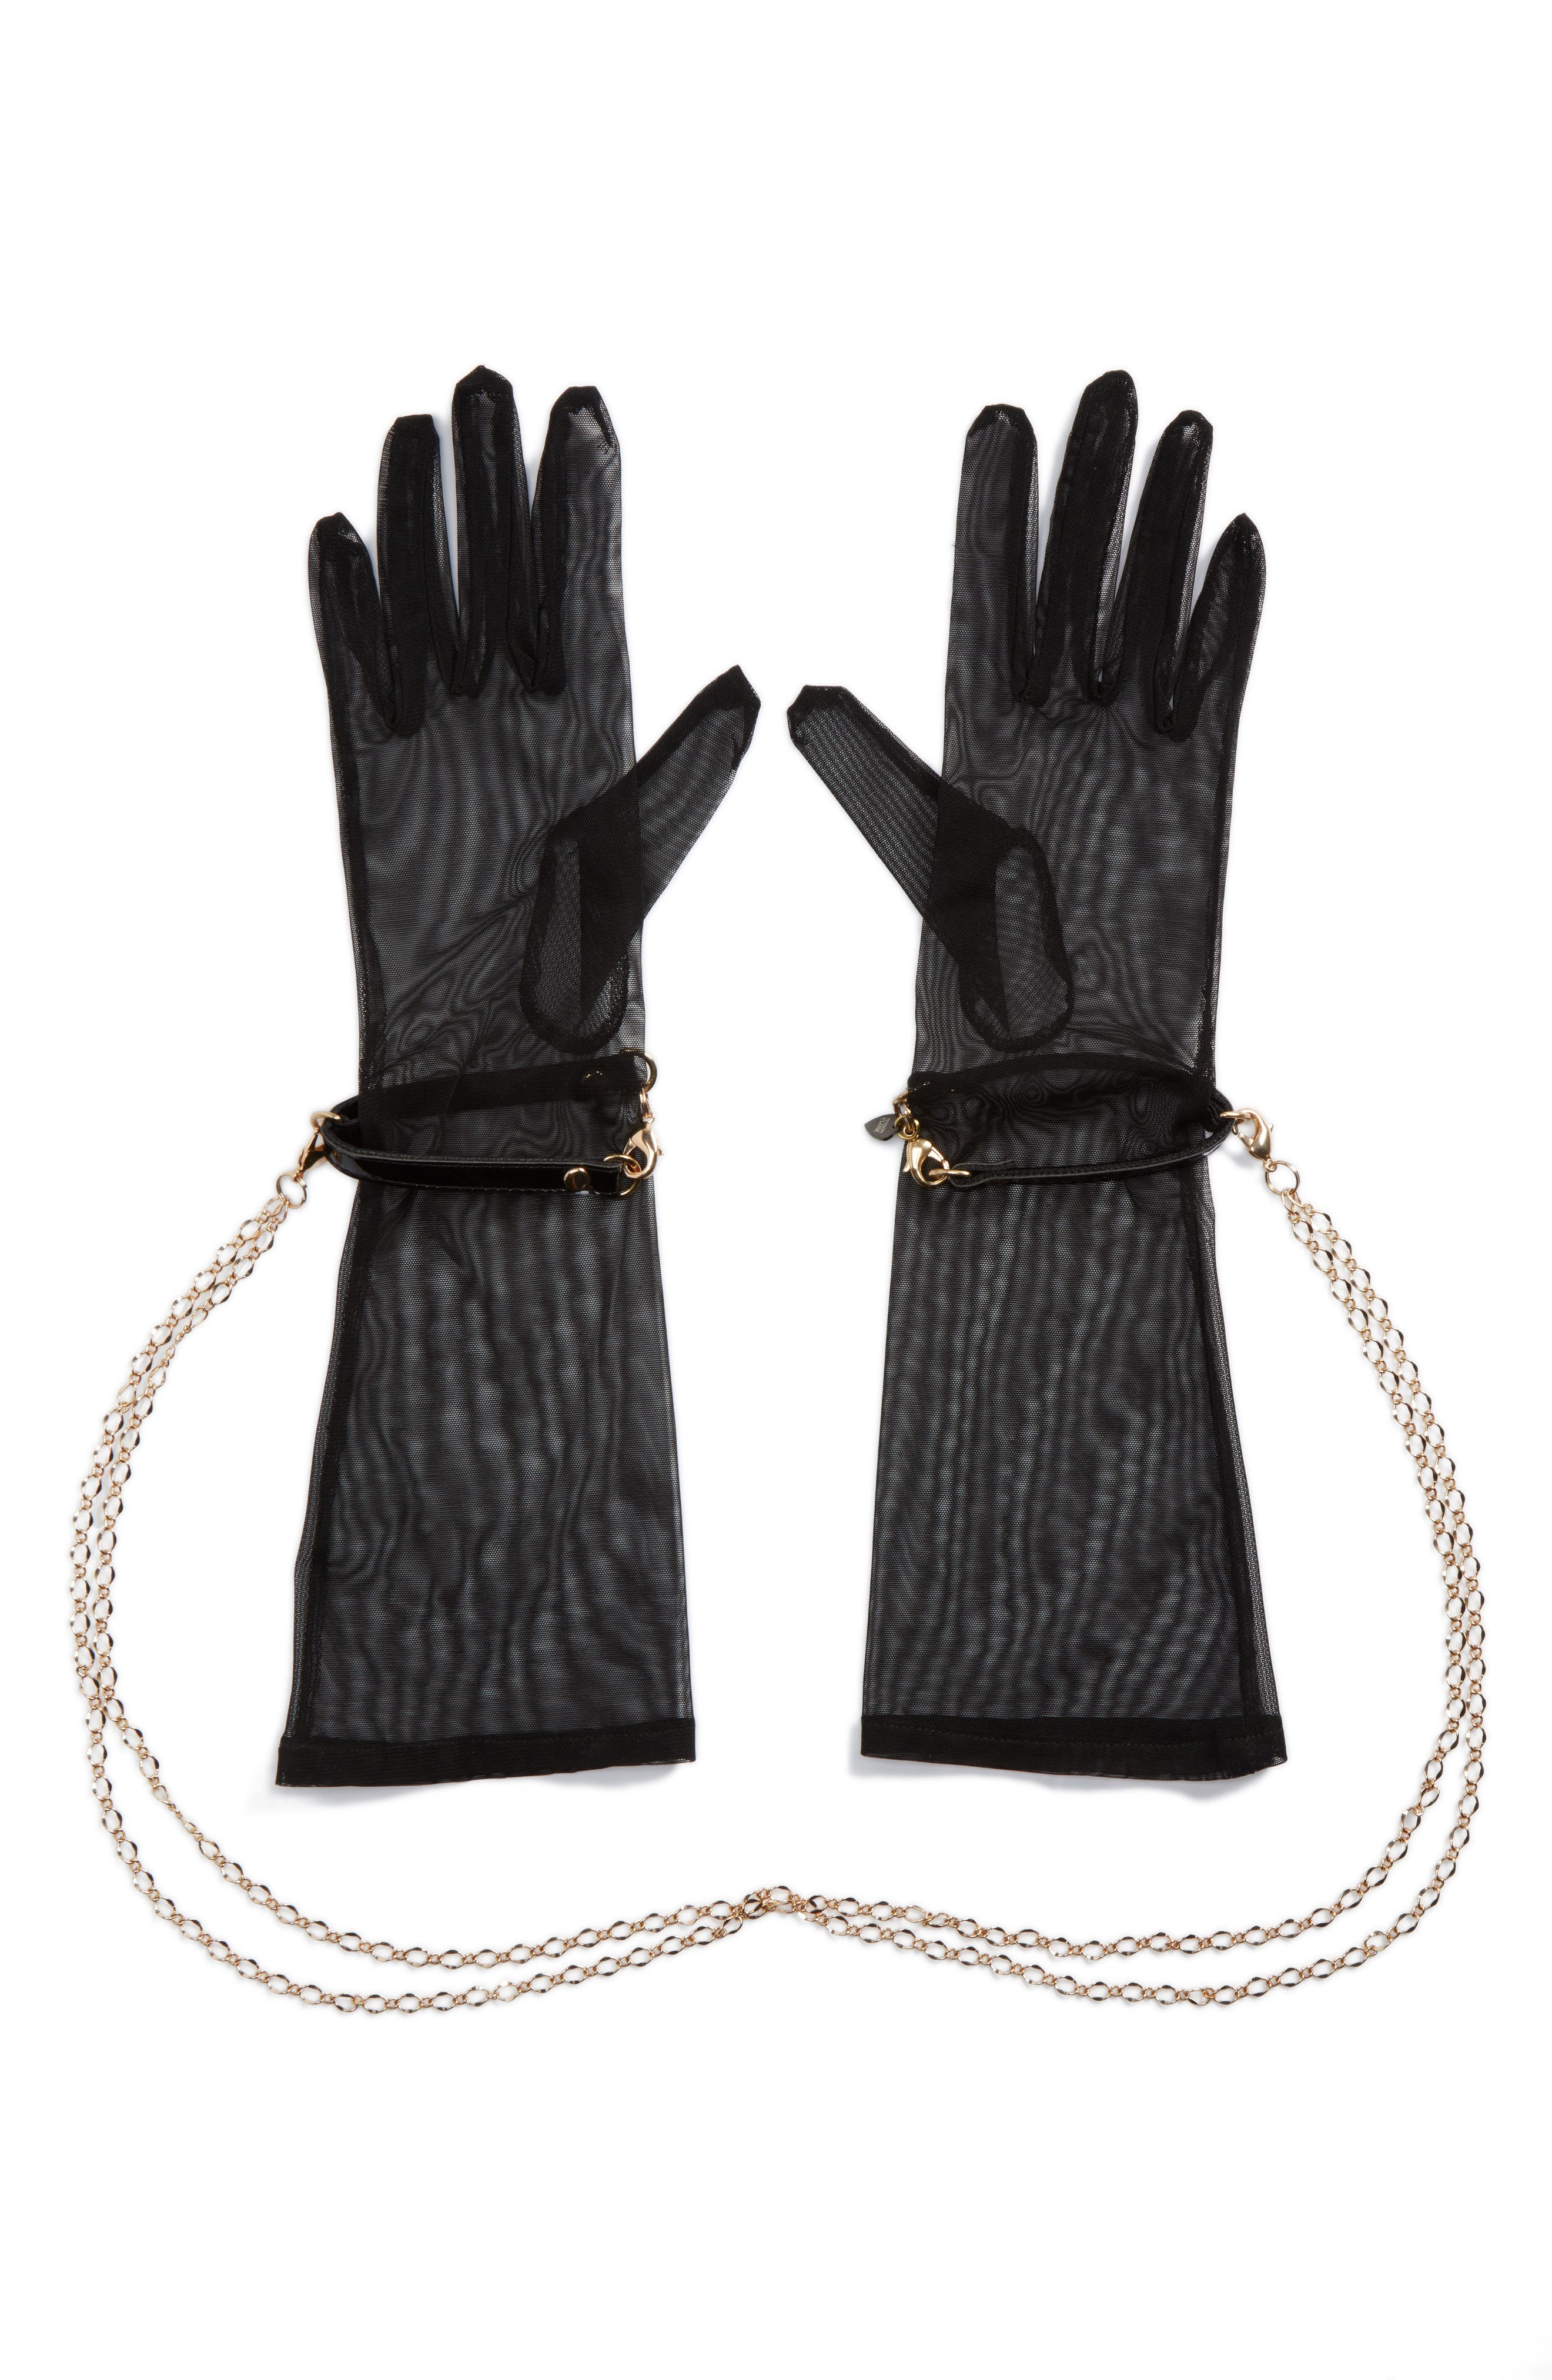 x Fräulein Kink Sheer Gloves,                             Main thumbnail 1, color,                             001